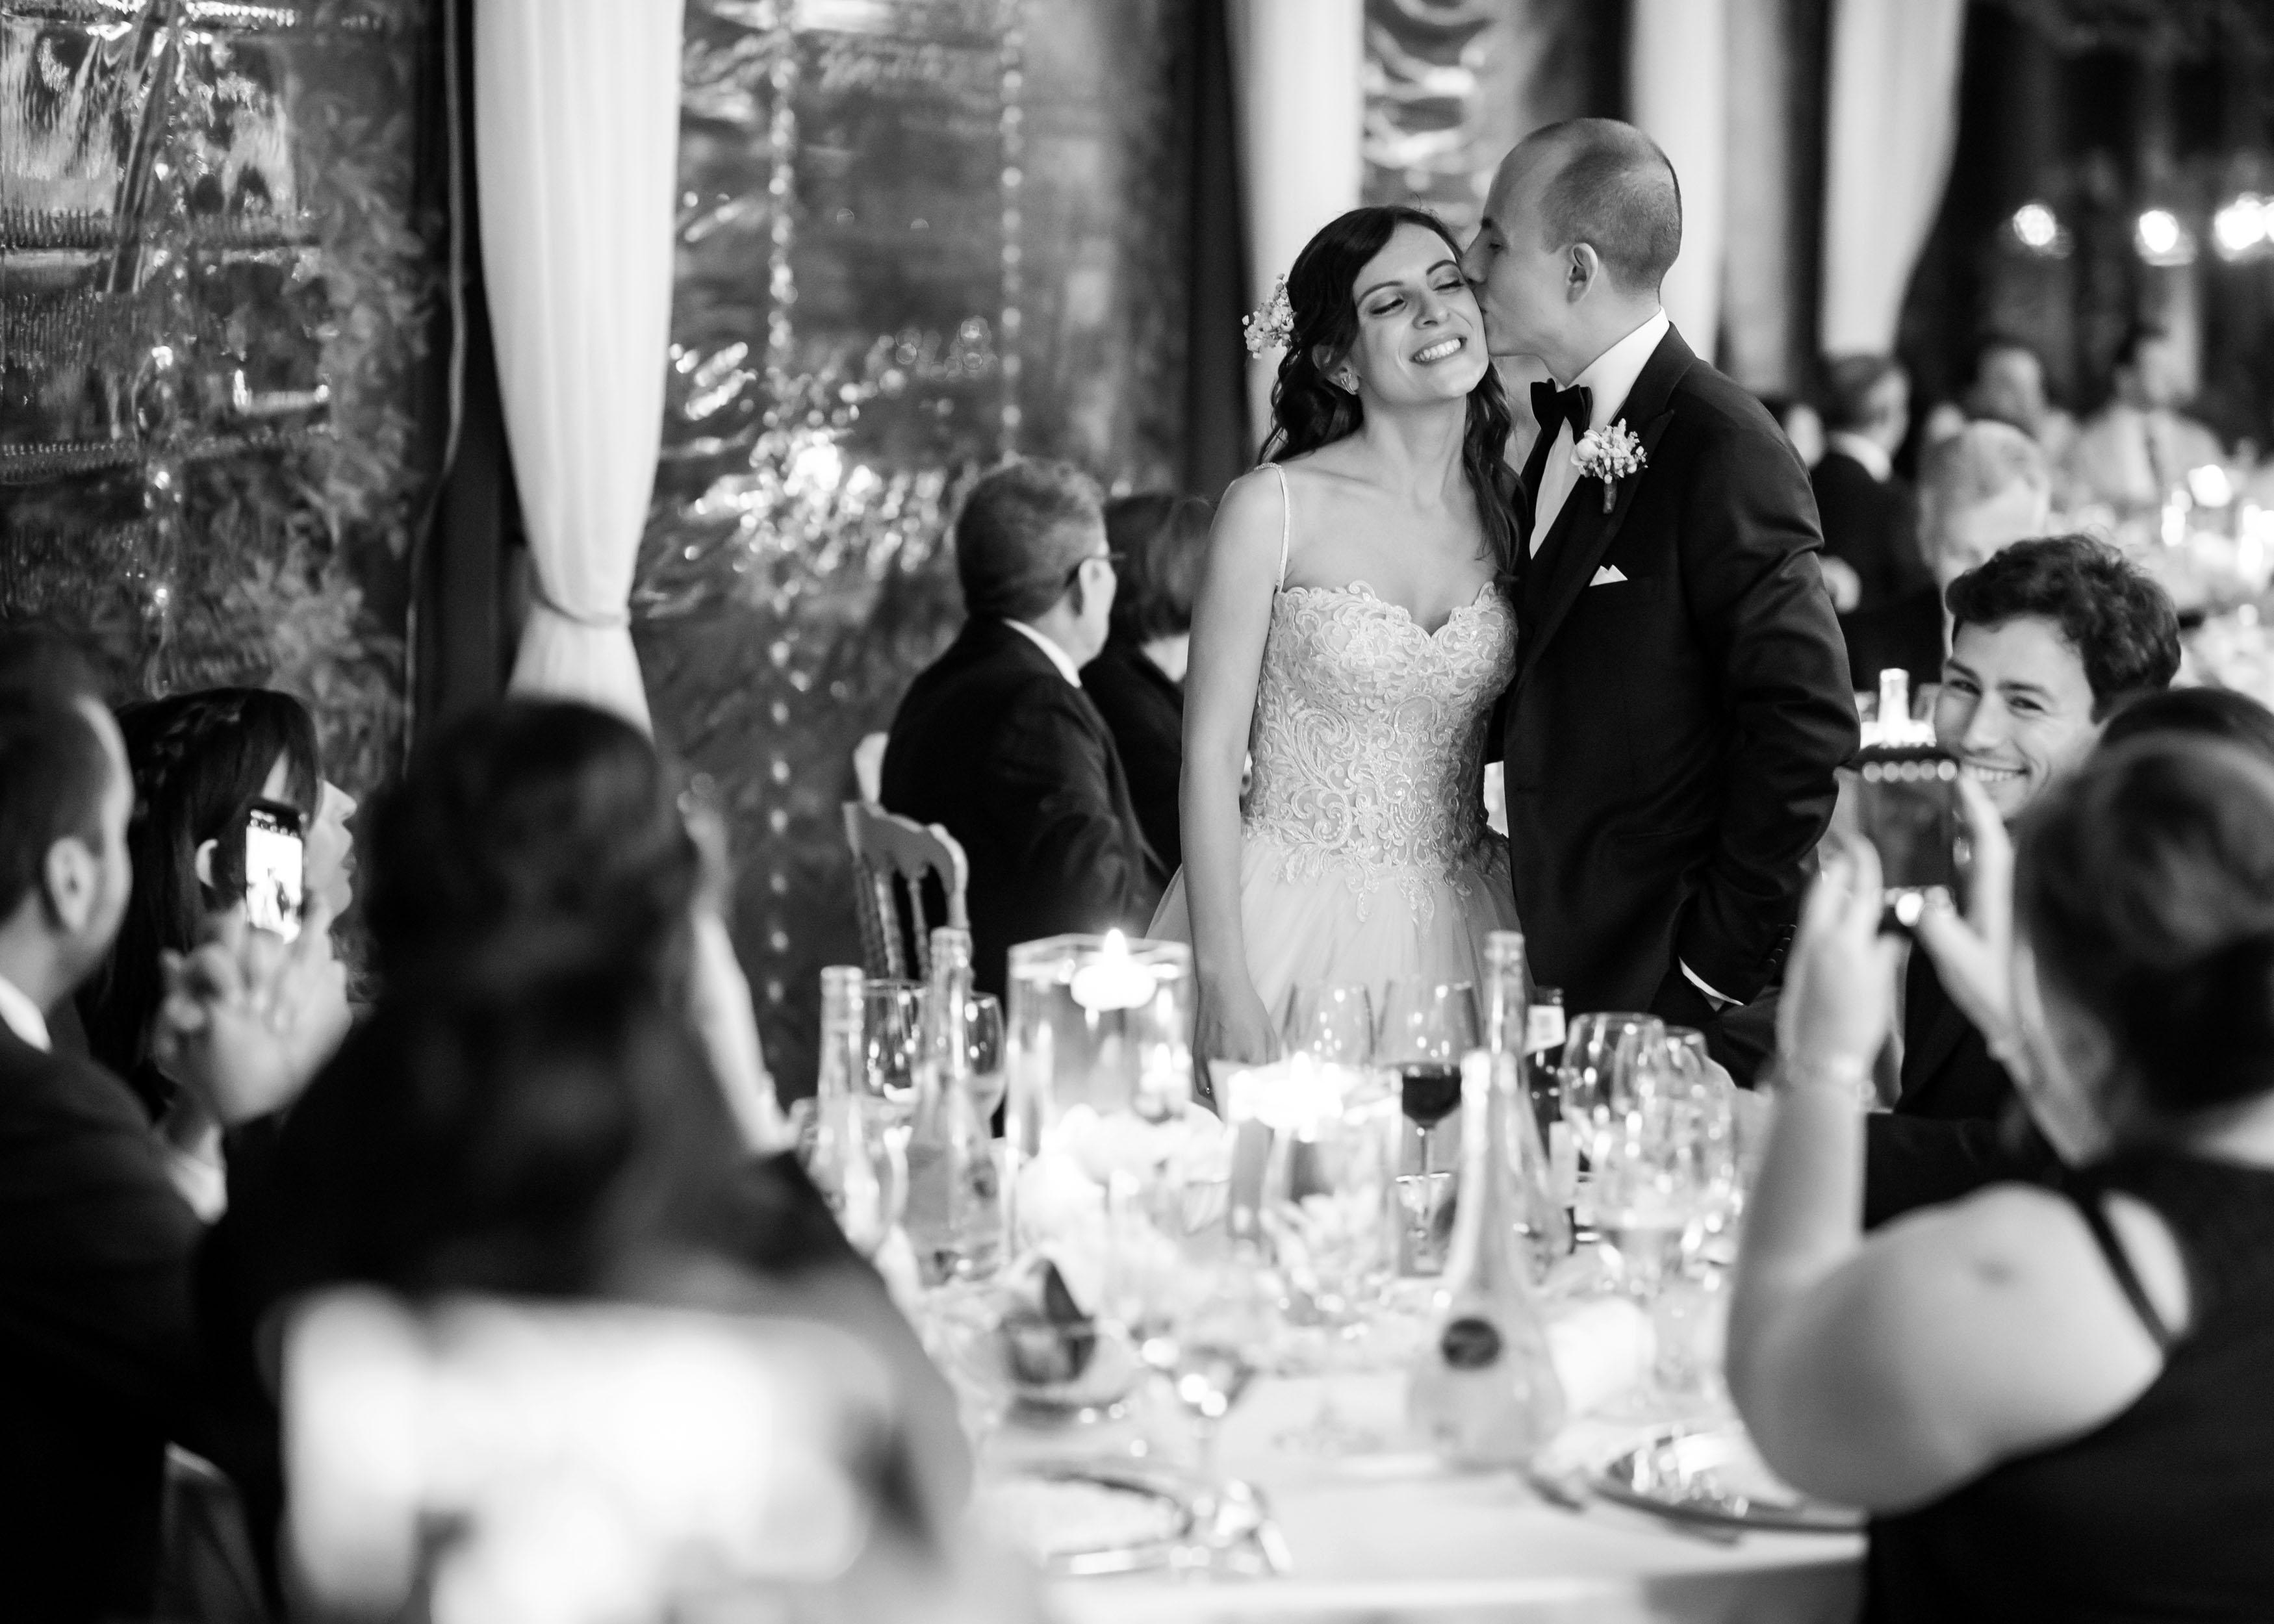 http://www.weddingamalfi.com/wp-content/uploads/Katia-Jorge-18-maggio-2019-43.jpg